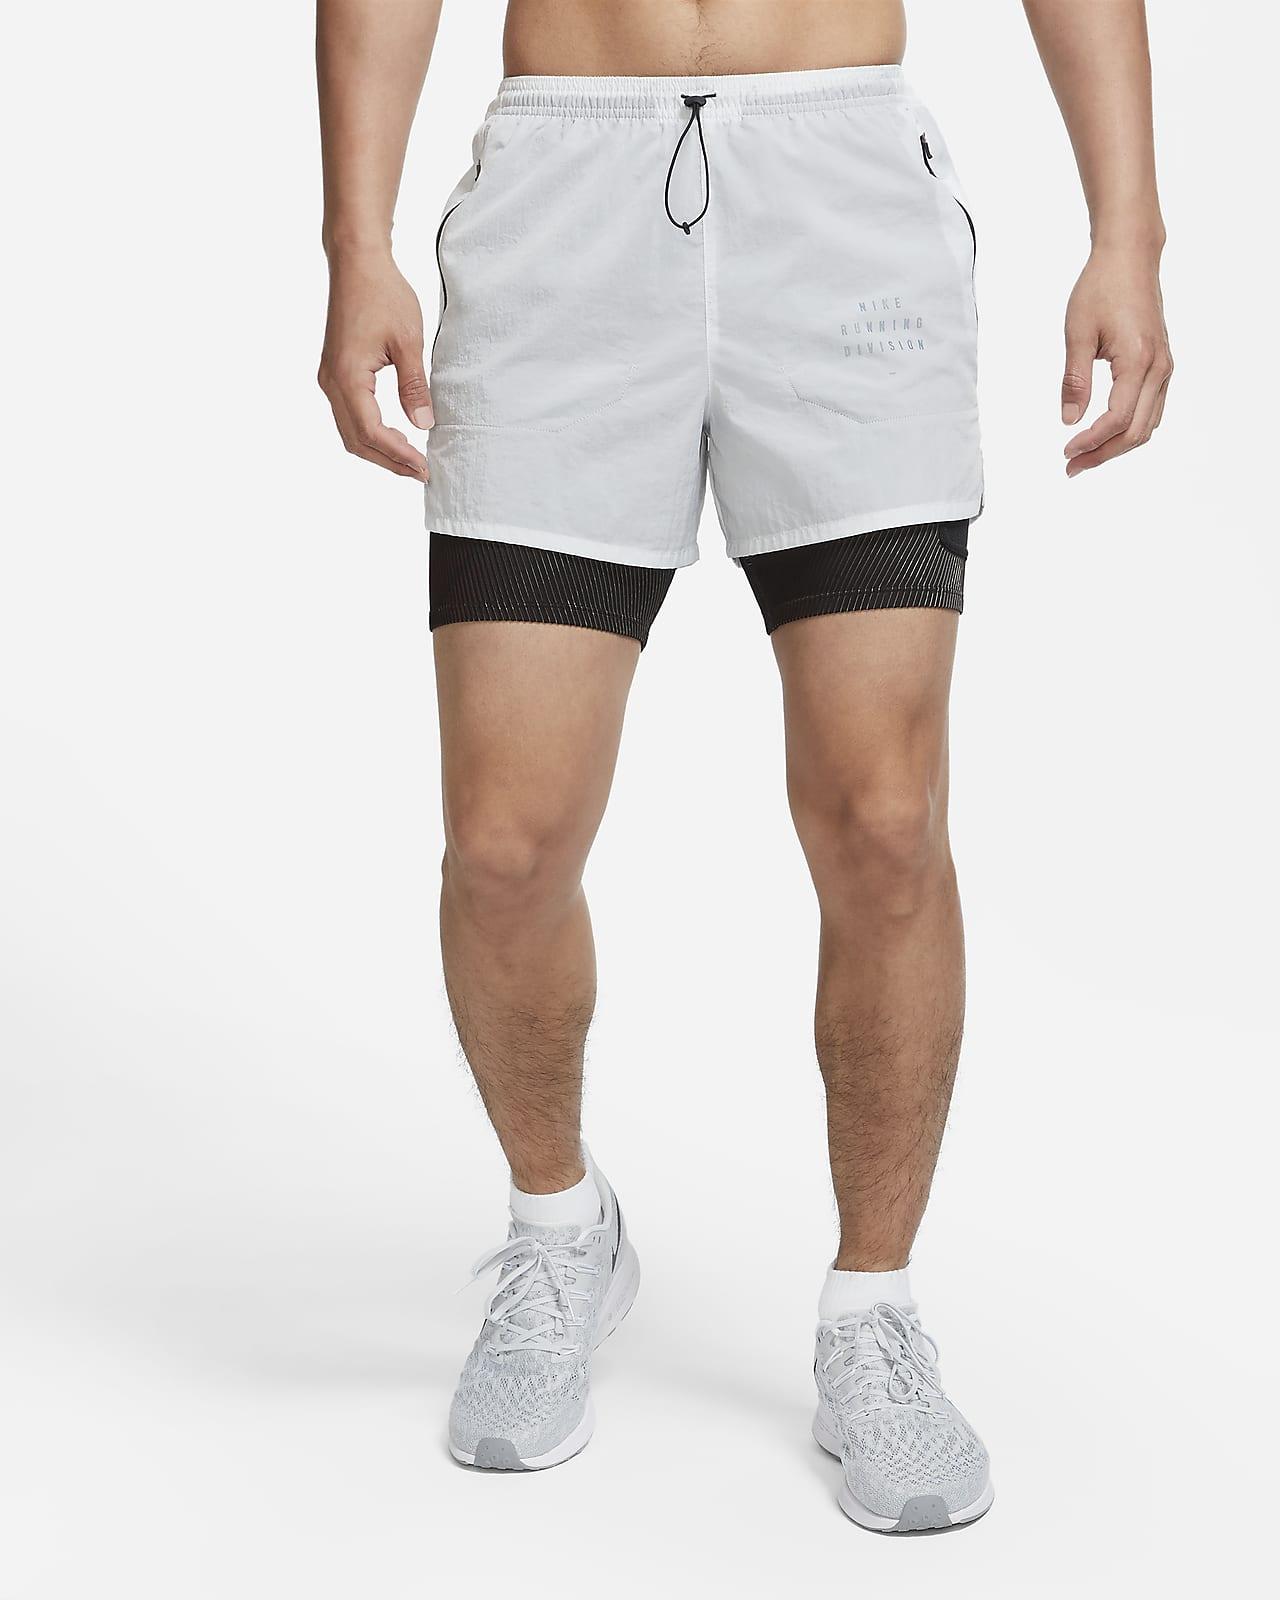 Nike Run Division 3-in-1 hardloopshorts voor heren